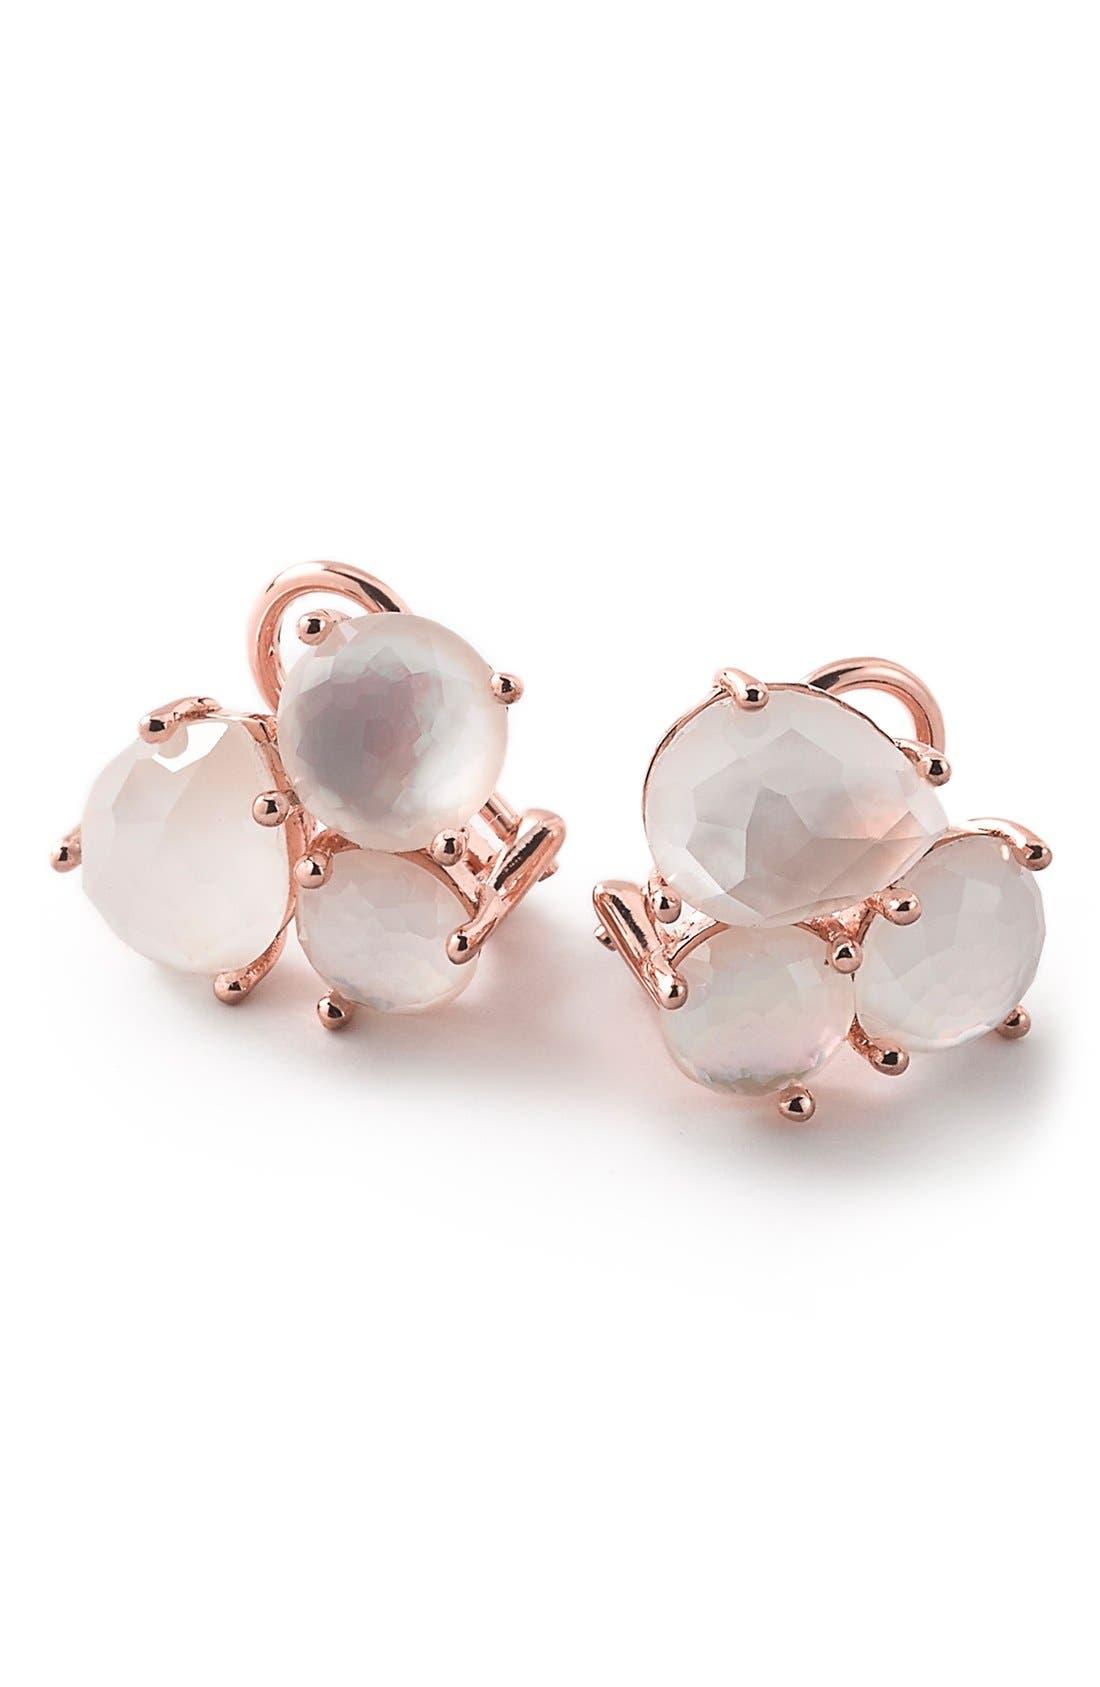 Alternate Image 1 Selected - Ippolita 'Rock Candy' Cluster Stud Earrings